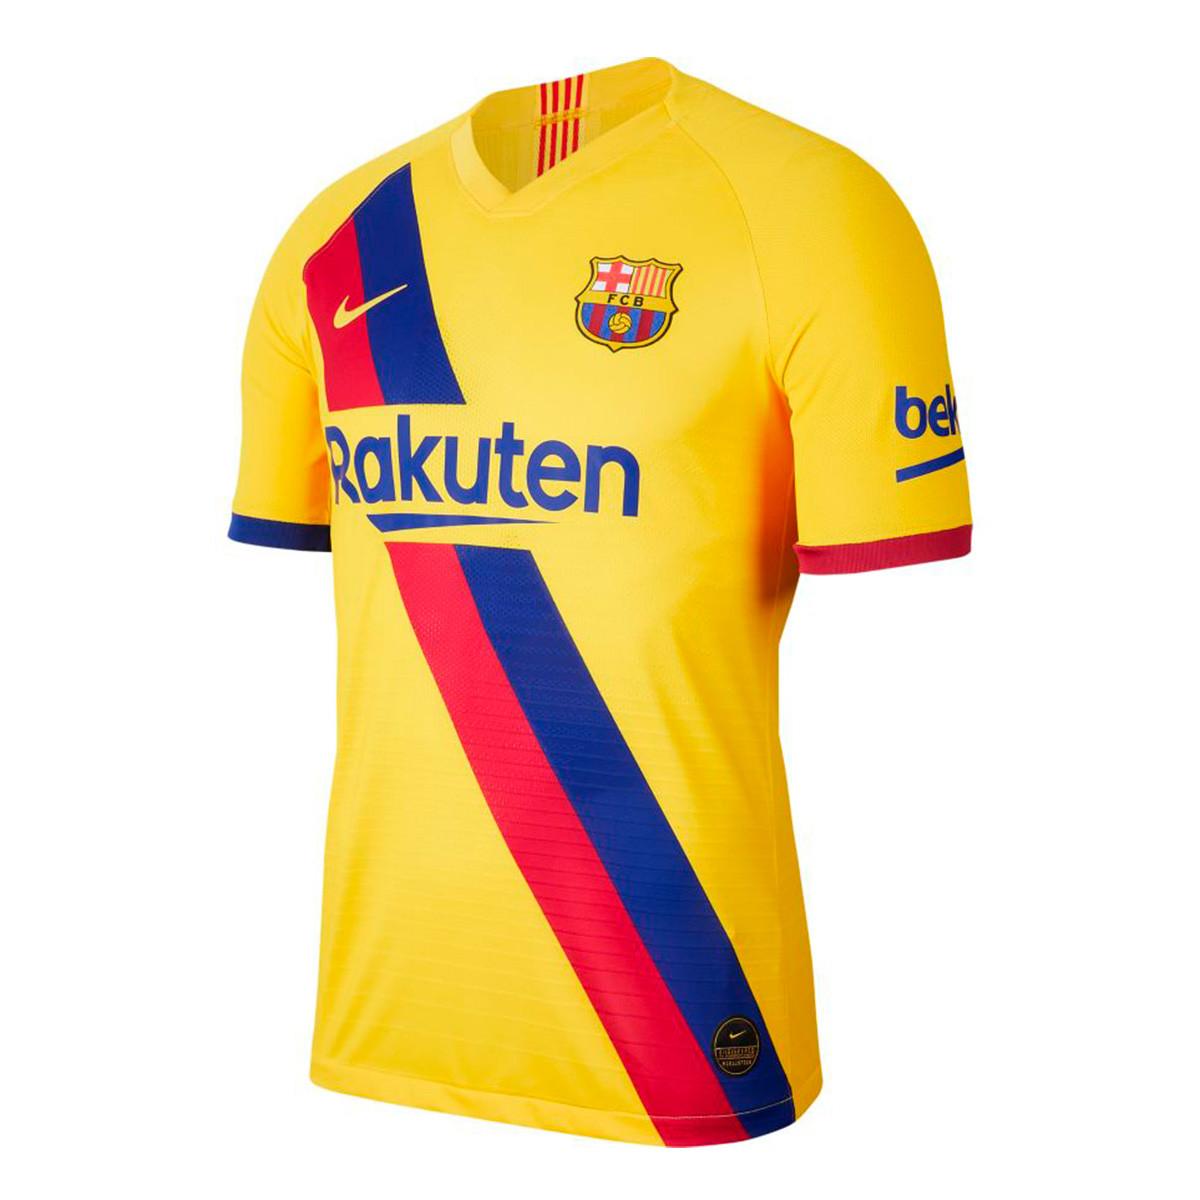 camiseta nike fc barcelona vapor match segunda equipacion 2019 2020 varsity maize tienda de futbol futbol emotion camiseta nike fc barcelona vapor match segunda equipacion 2019 2020